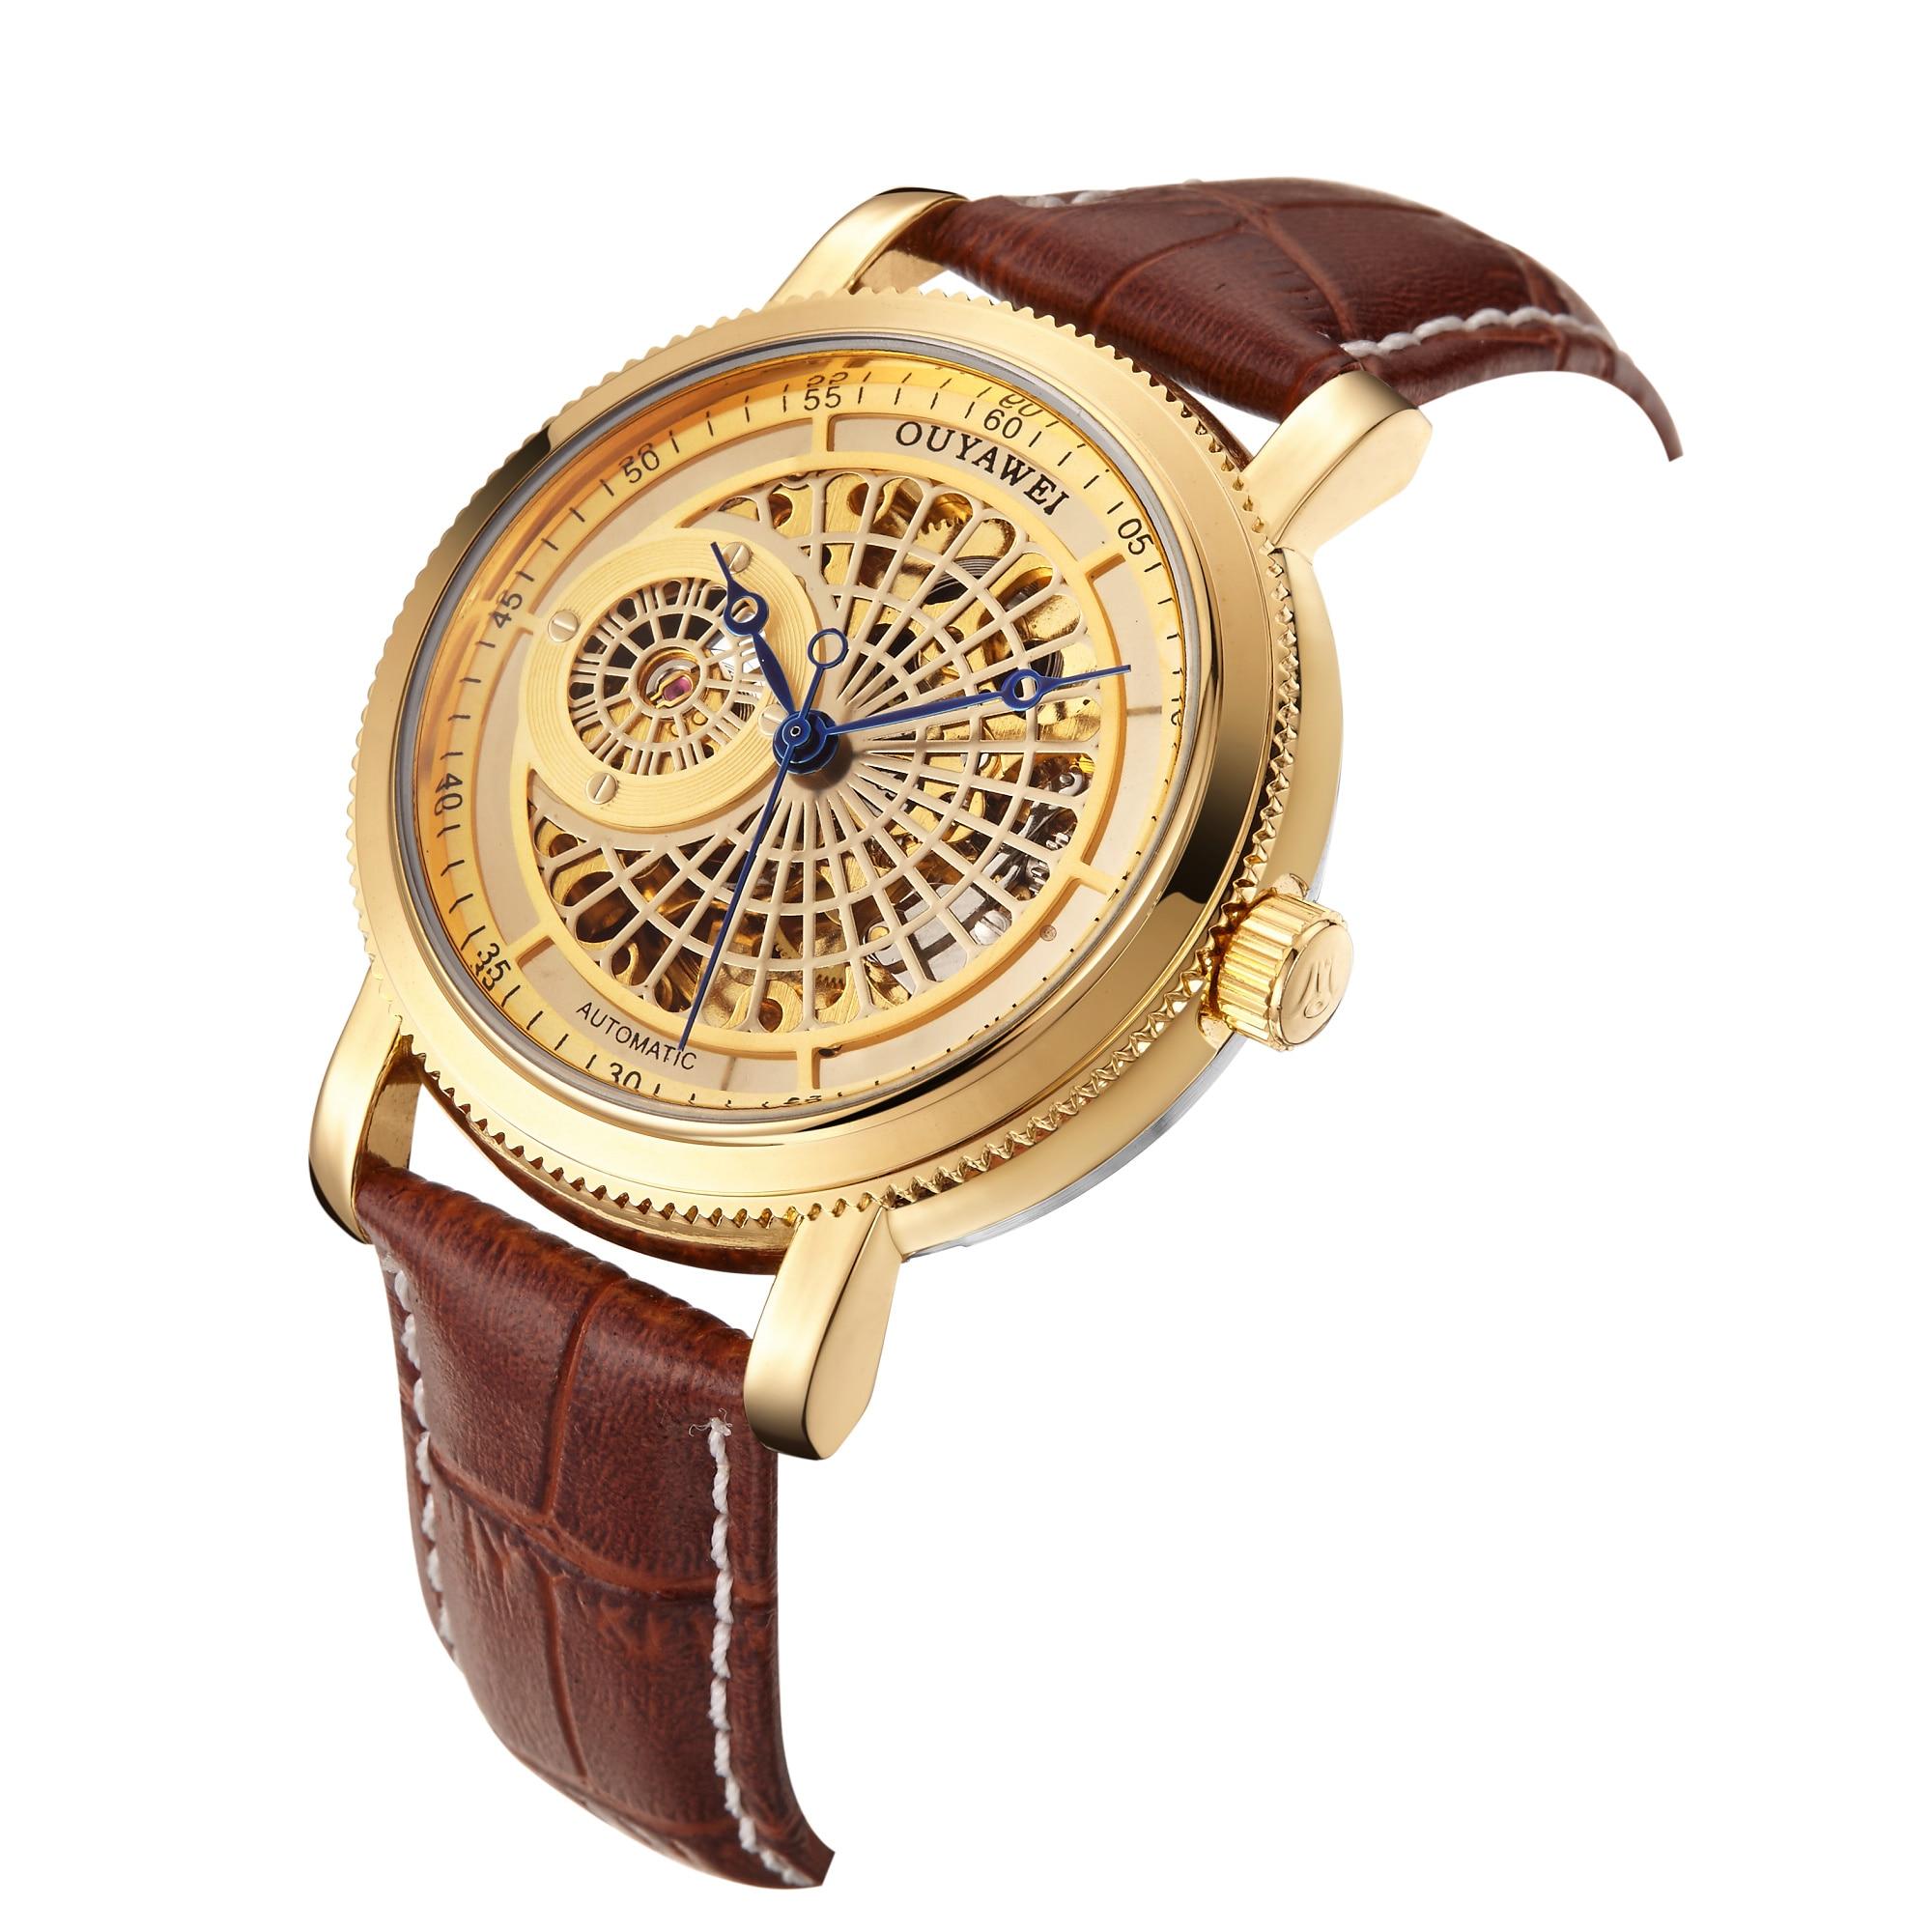 H1bdb717e8b214e7395f6999247362194C Mechanical Gold Watch Luxury Brand Self-winding